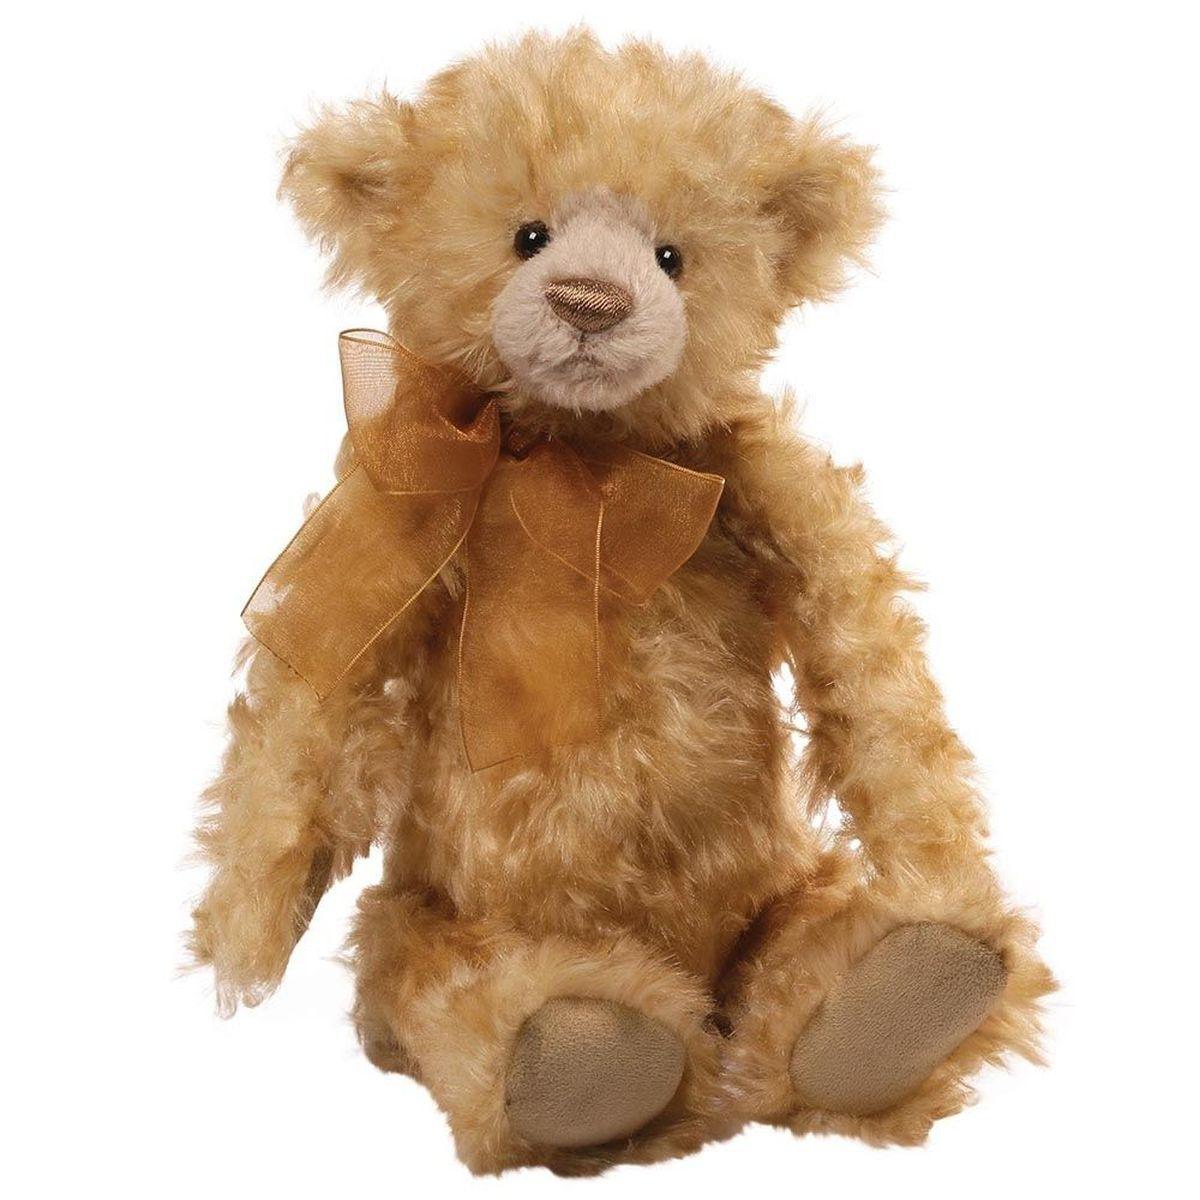 Gund Мягкая игрушка Braden Bear 33 см gund мягкая игрушка perry bear 40 5 см